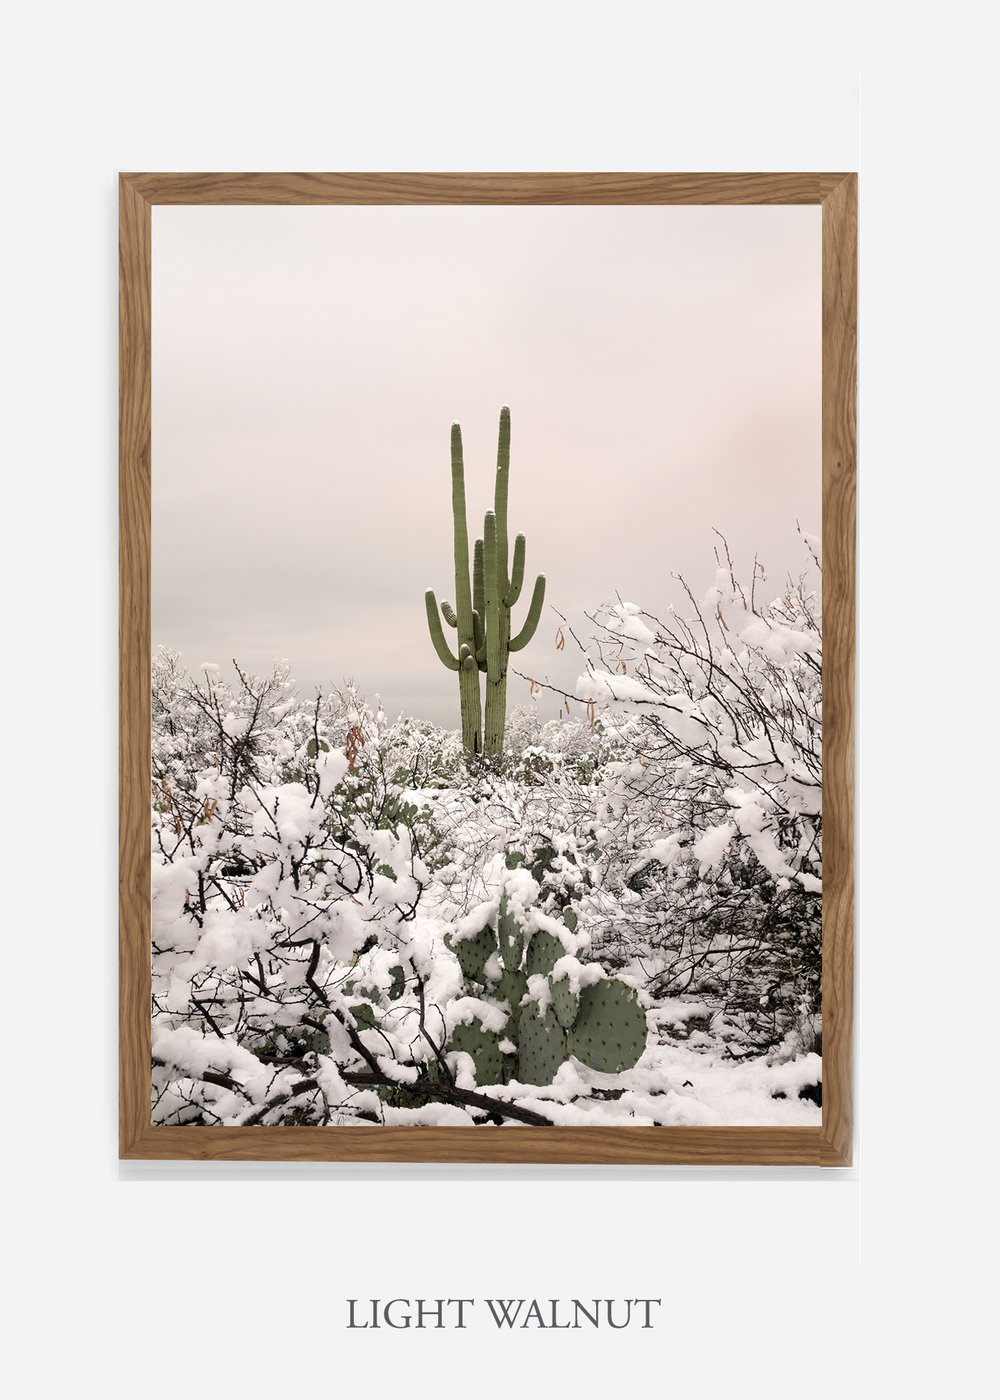 nomat-lightwalnutframe-saguaroNo.2-wildercalifornia-art-wallart-cactusprint-homedecor-prints-arizona-botanical-artwork-interiordesign.jpg